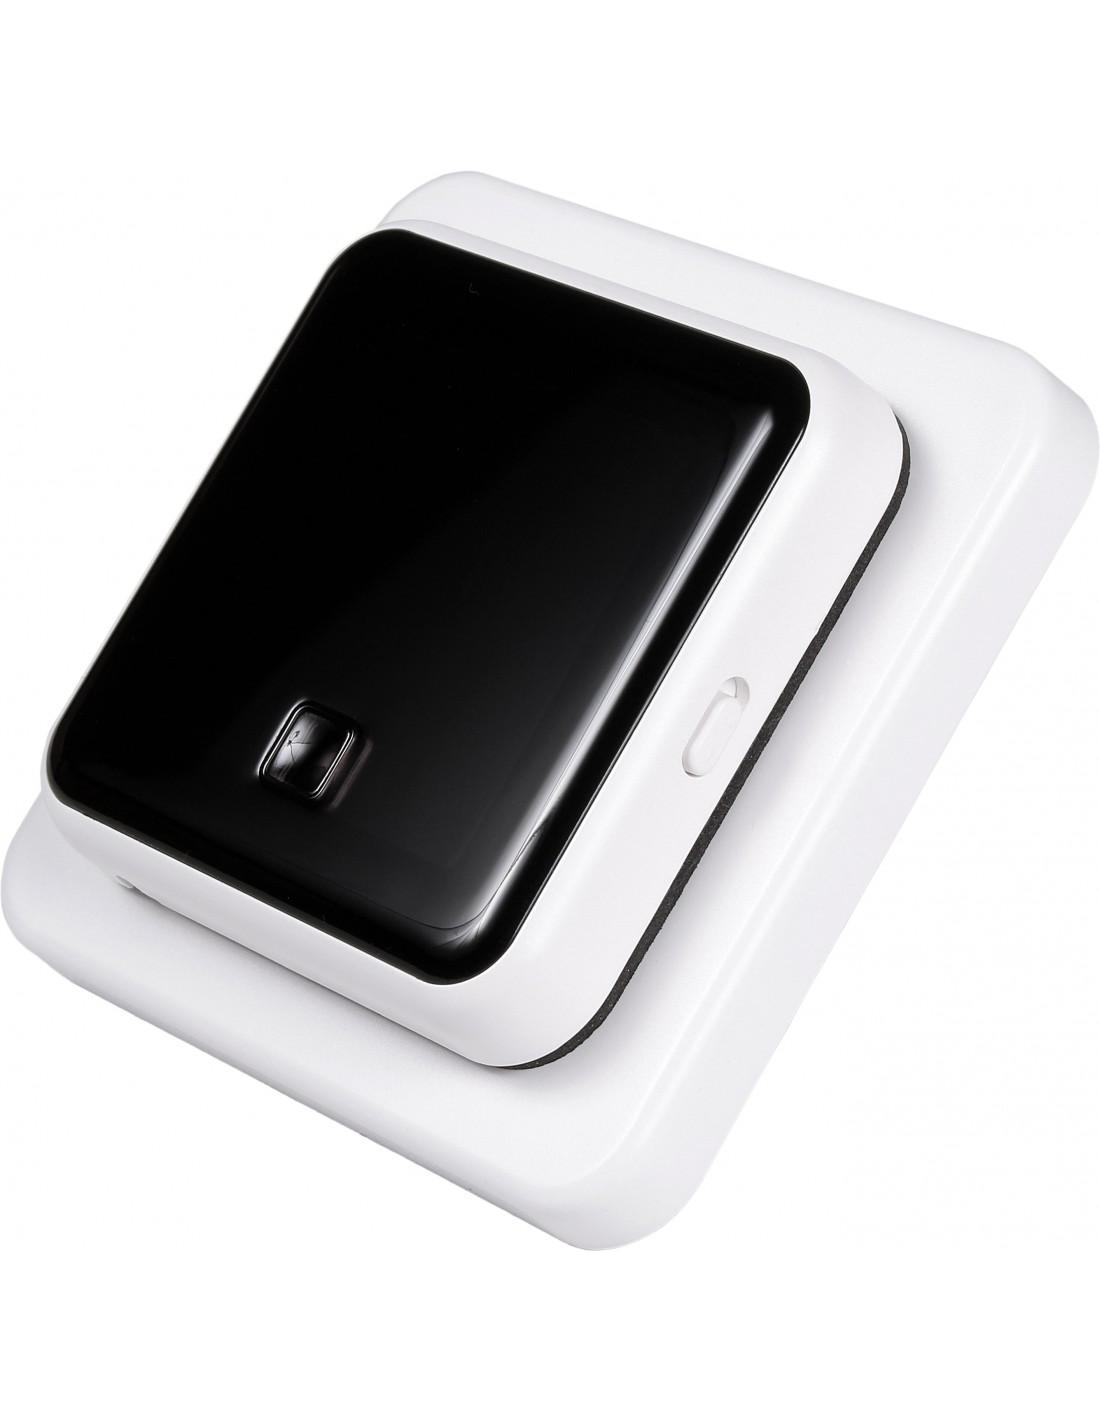 edelstahl rostfrei duschrinne sieme 900 mm clear modernedusche. Black Bedroom Furniture Sets. Home Design Ideas